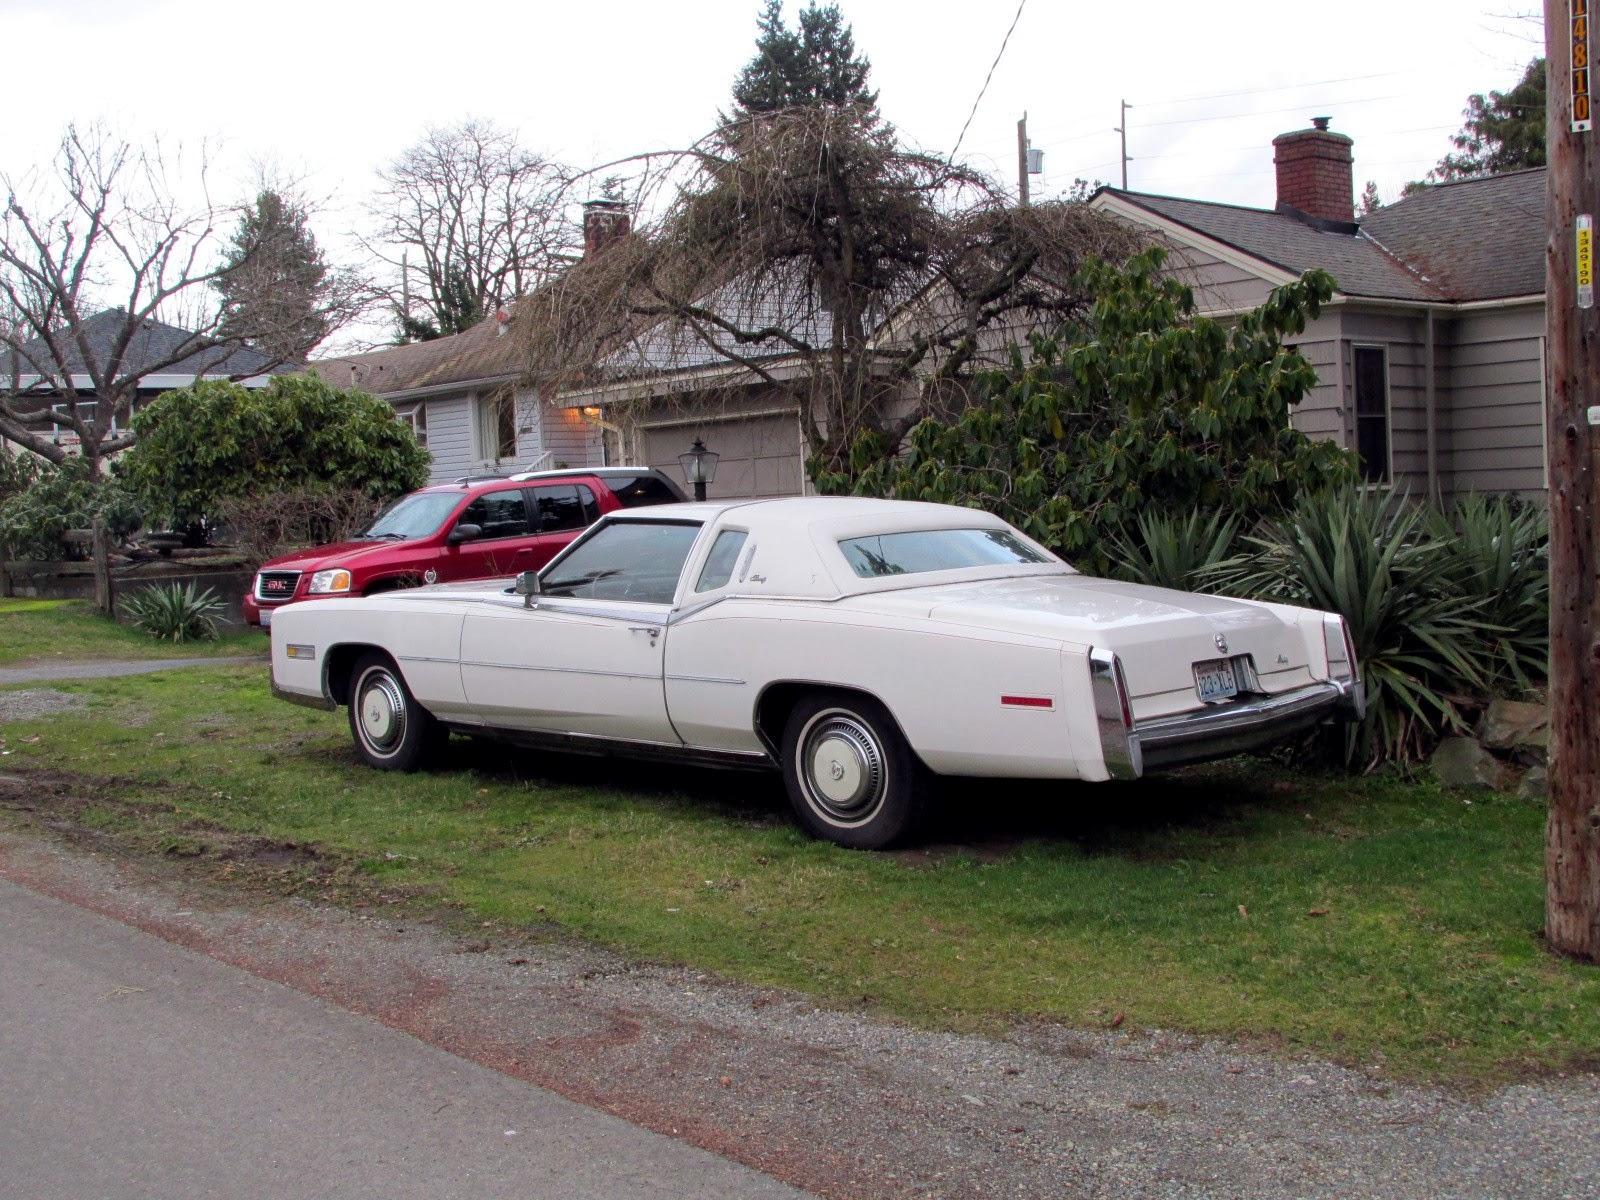 Seattle's Classics: 1978 Cadillac Eldordo Barritz